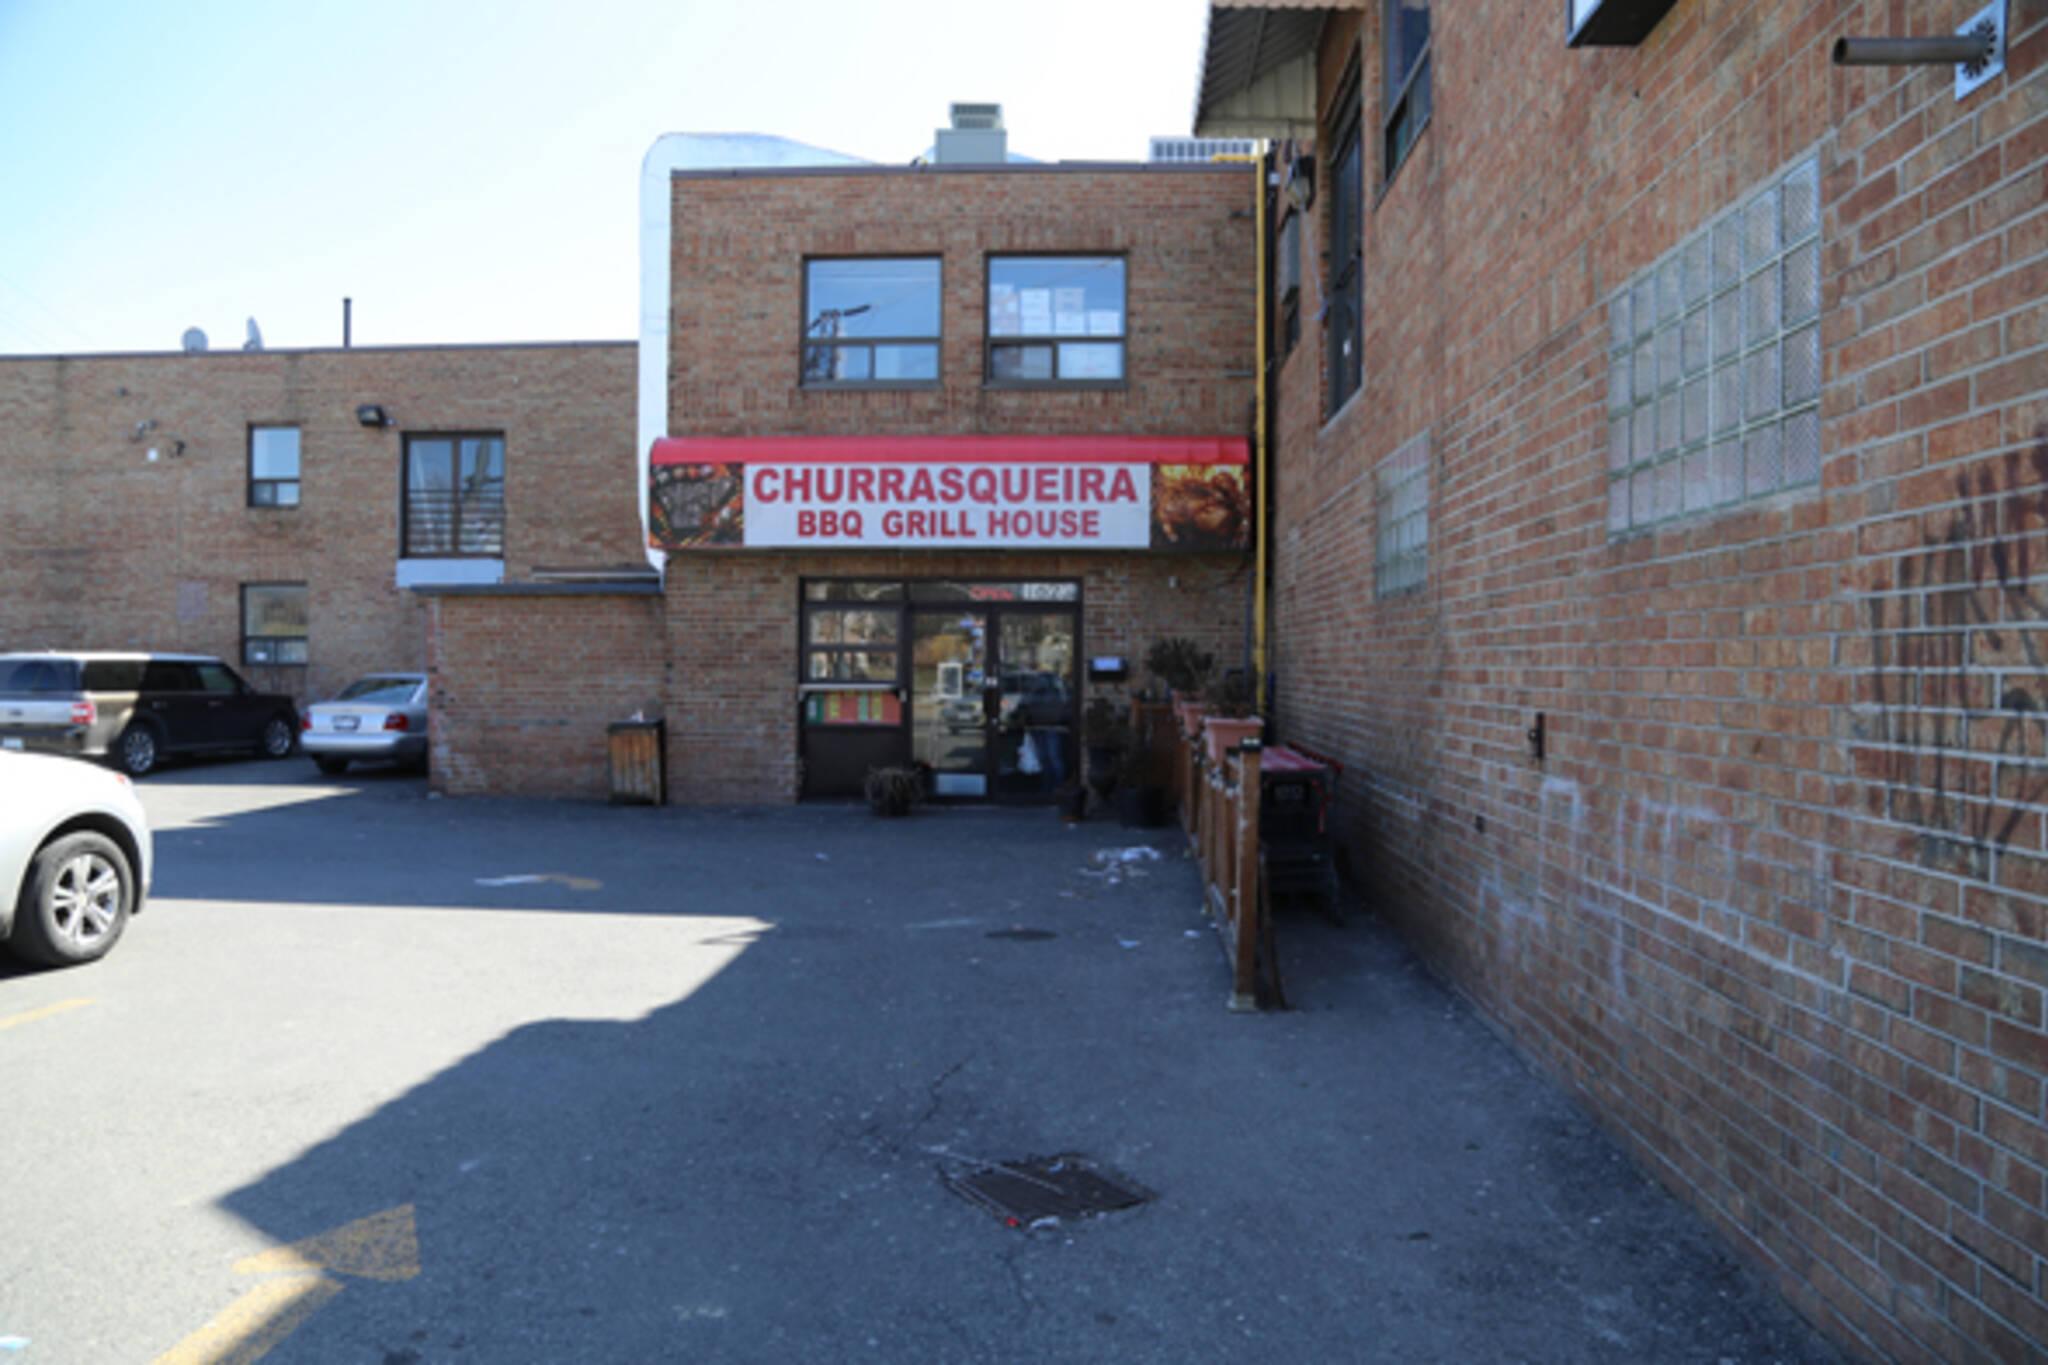 Churrasqueira BBQ Grill House Toronto